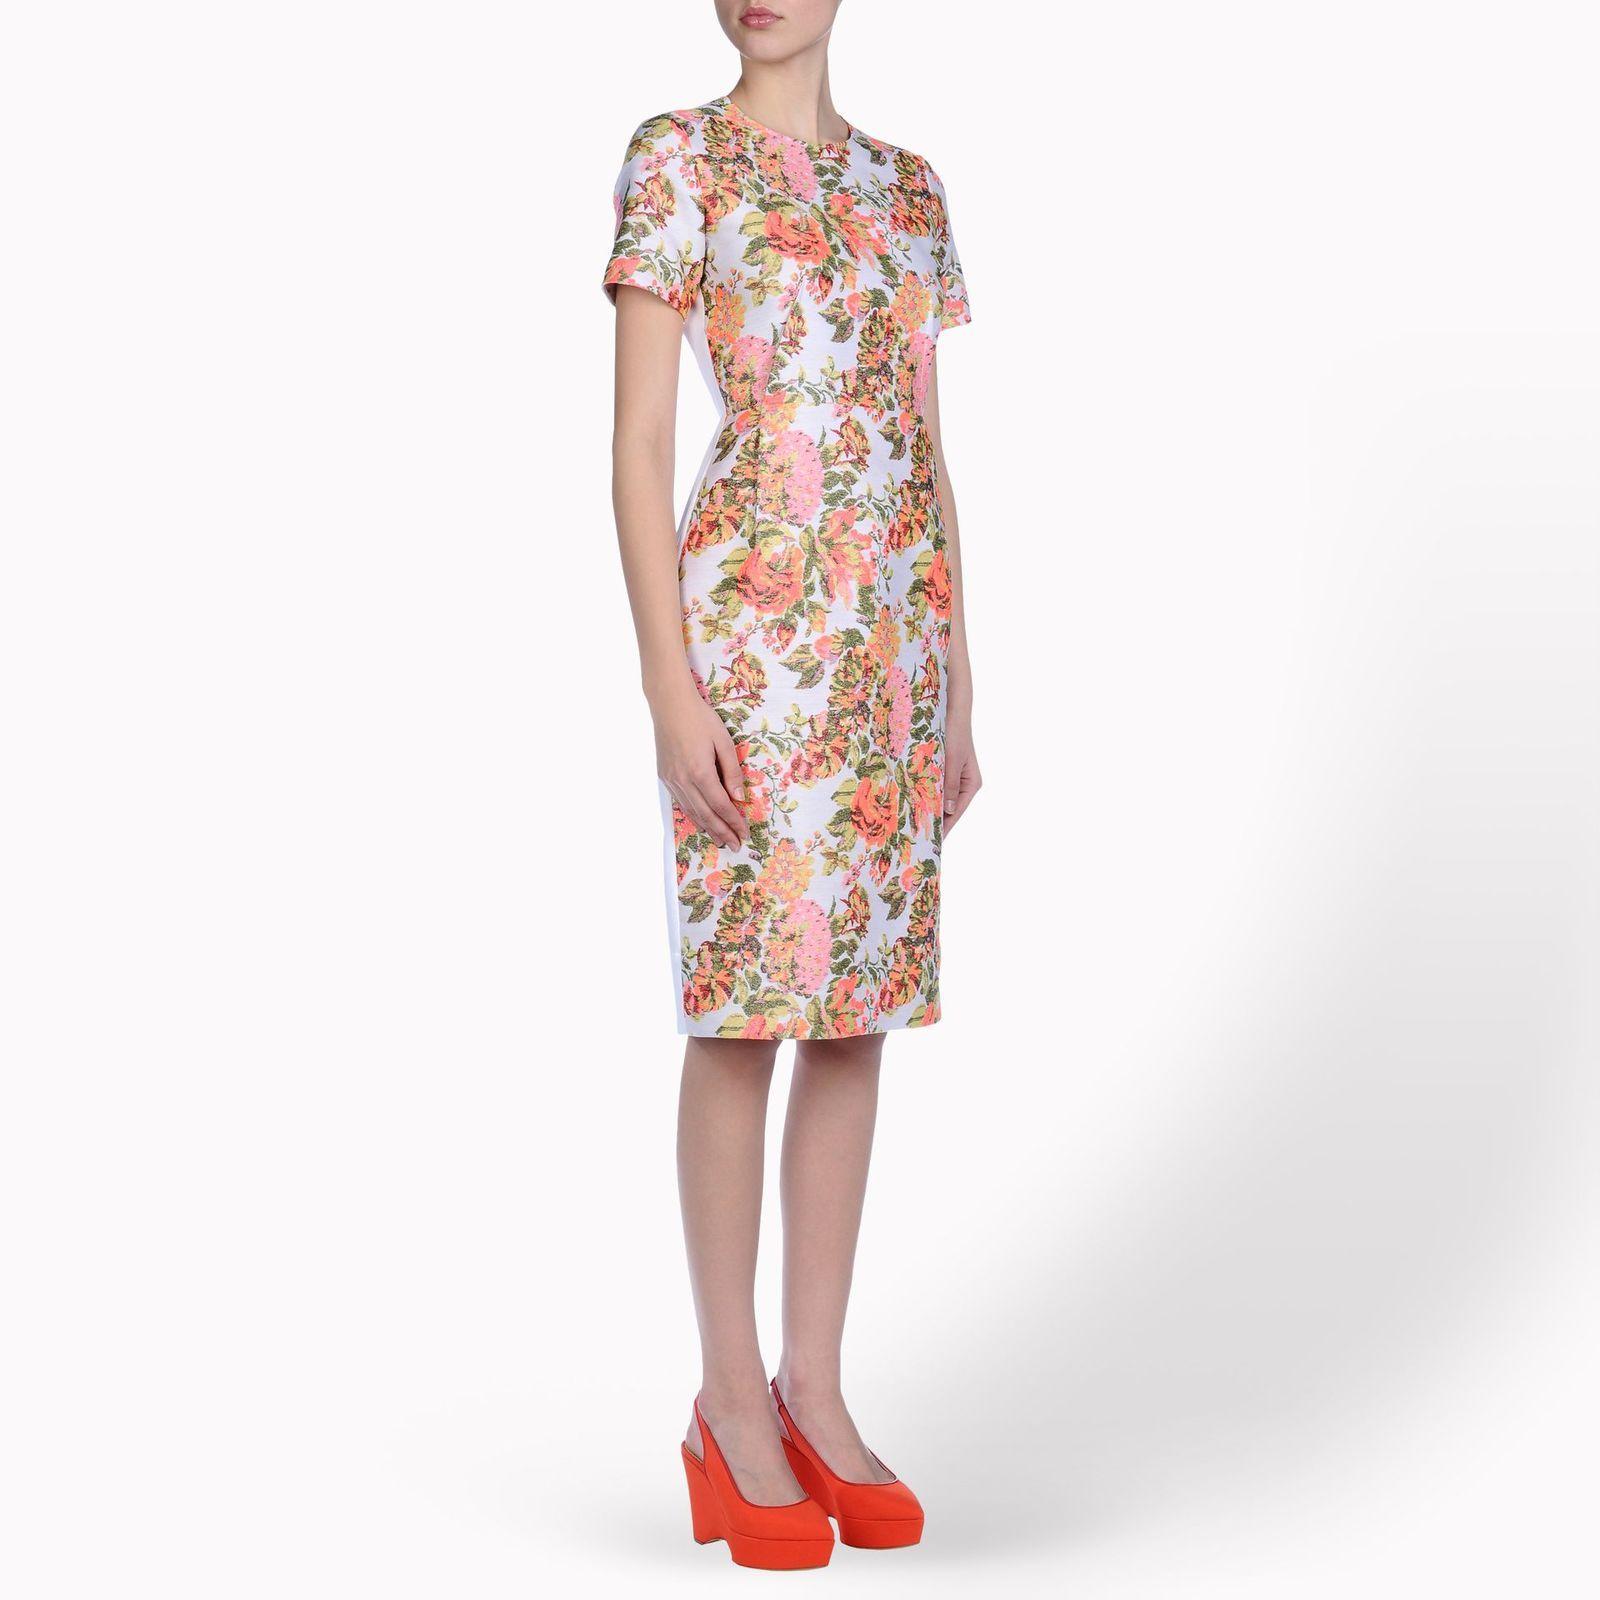 Gojee  Ridley Jacquard Floral Dress